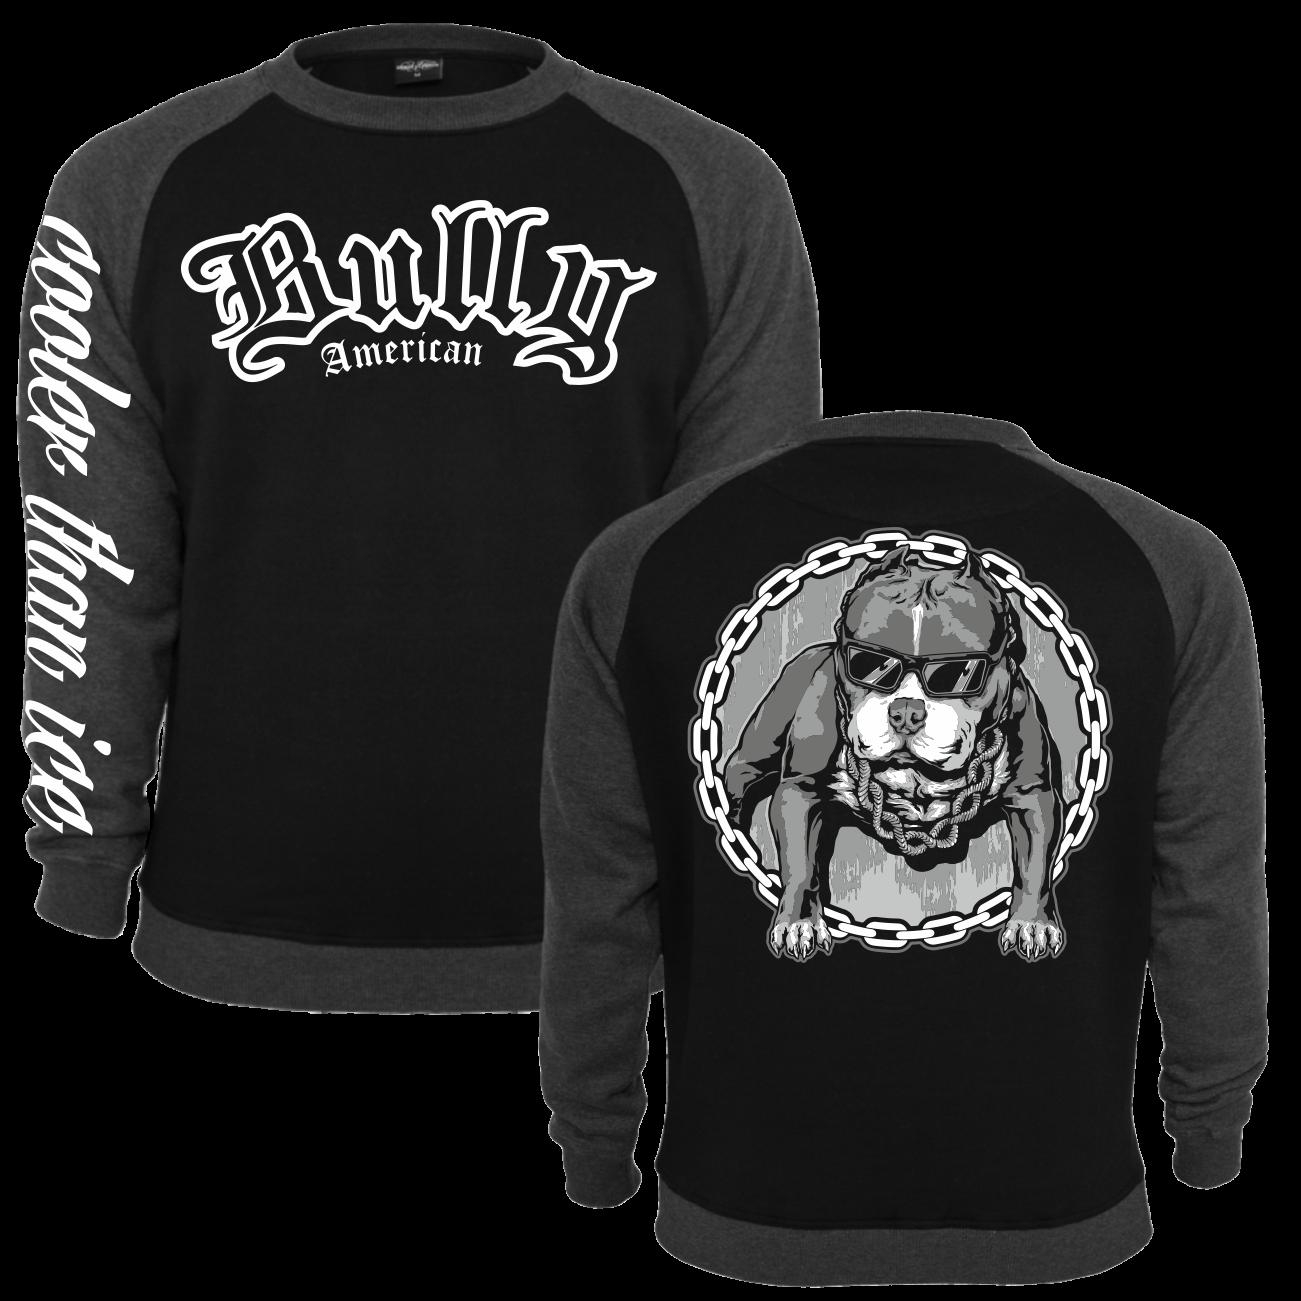 pullover sweatshirt american bully cool summer bulldog bullies hunde rasse zucht ebay. Black Bedroom Furniture Sets. Home Design Ideas